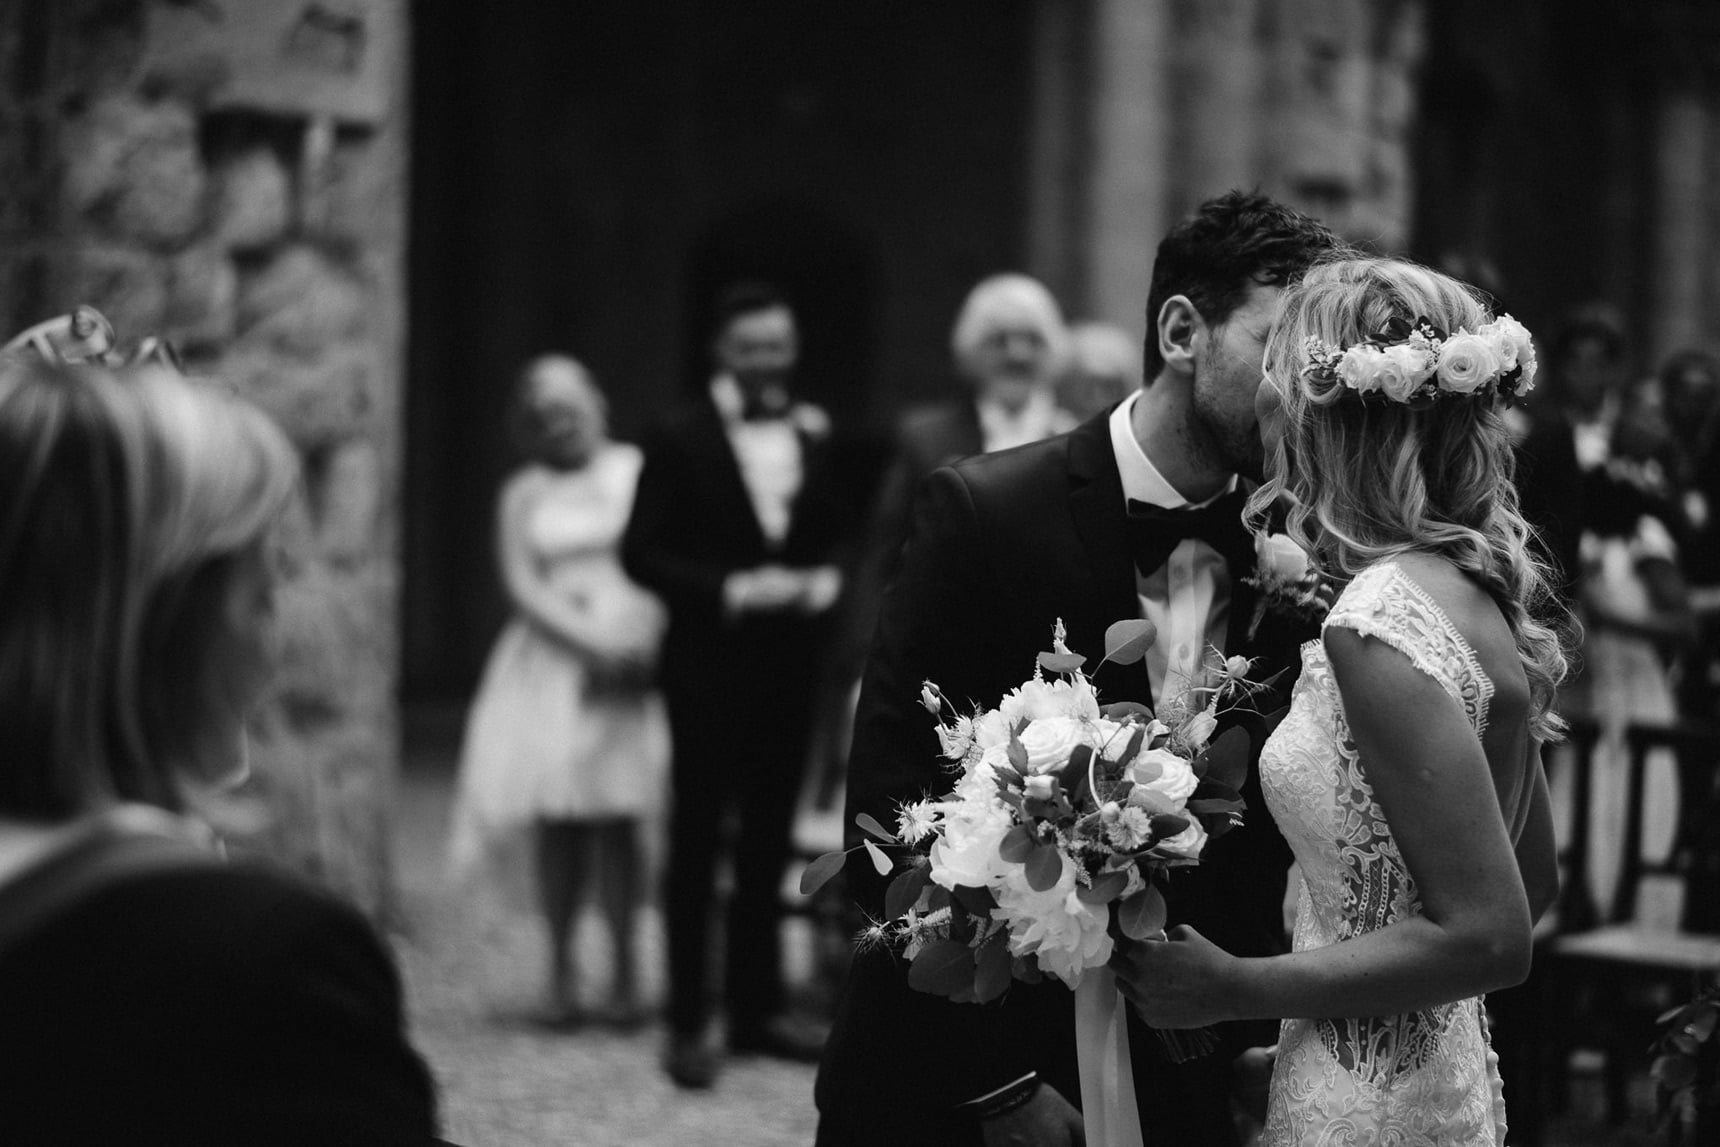 Wedding at San Galgano, M+L Wedding At San Galgano Farm House, Federico Pannacci, Federico Pannacci